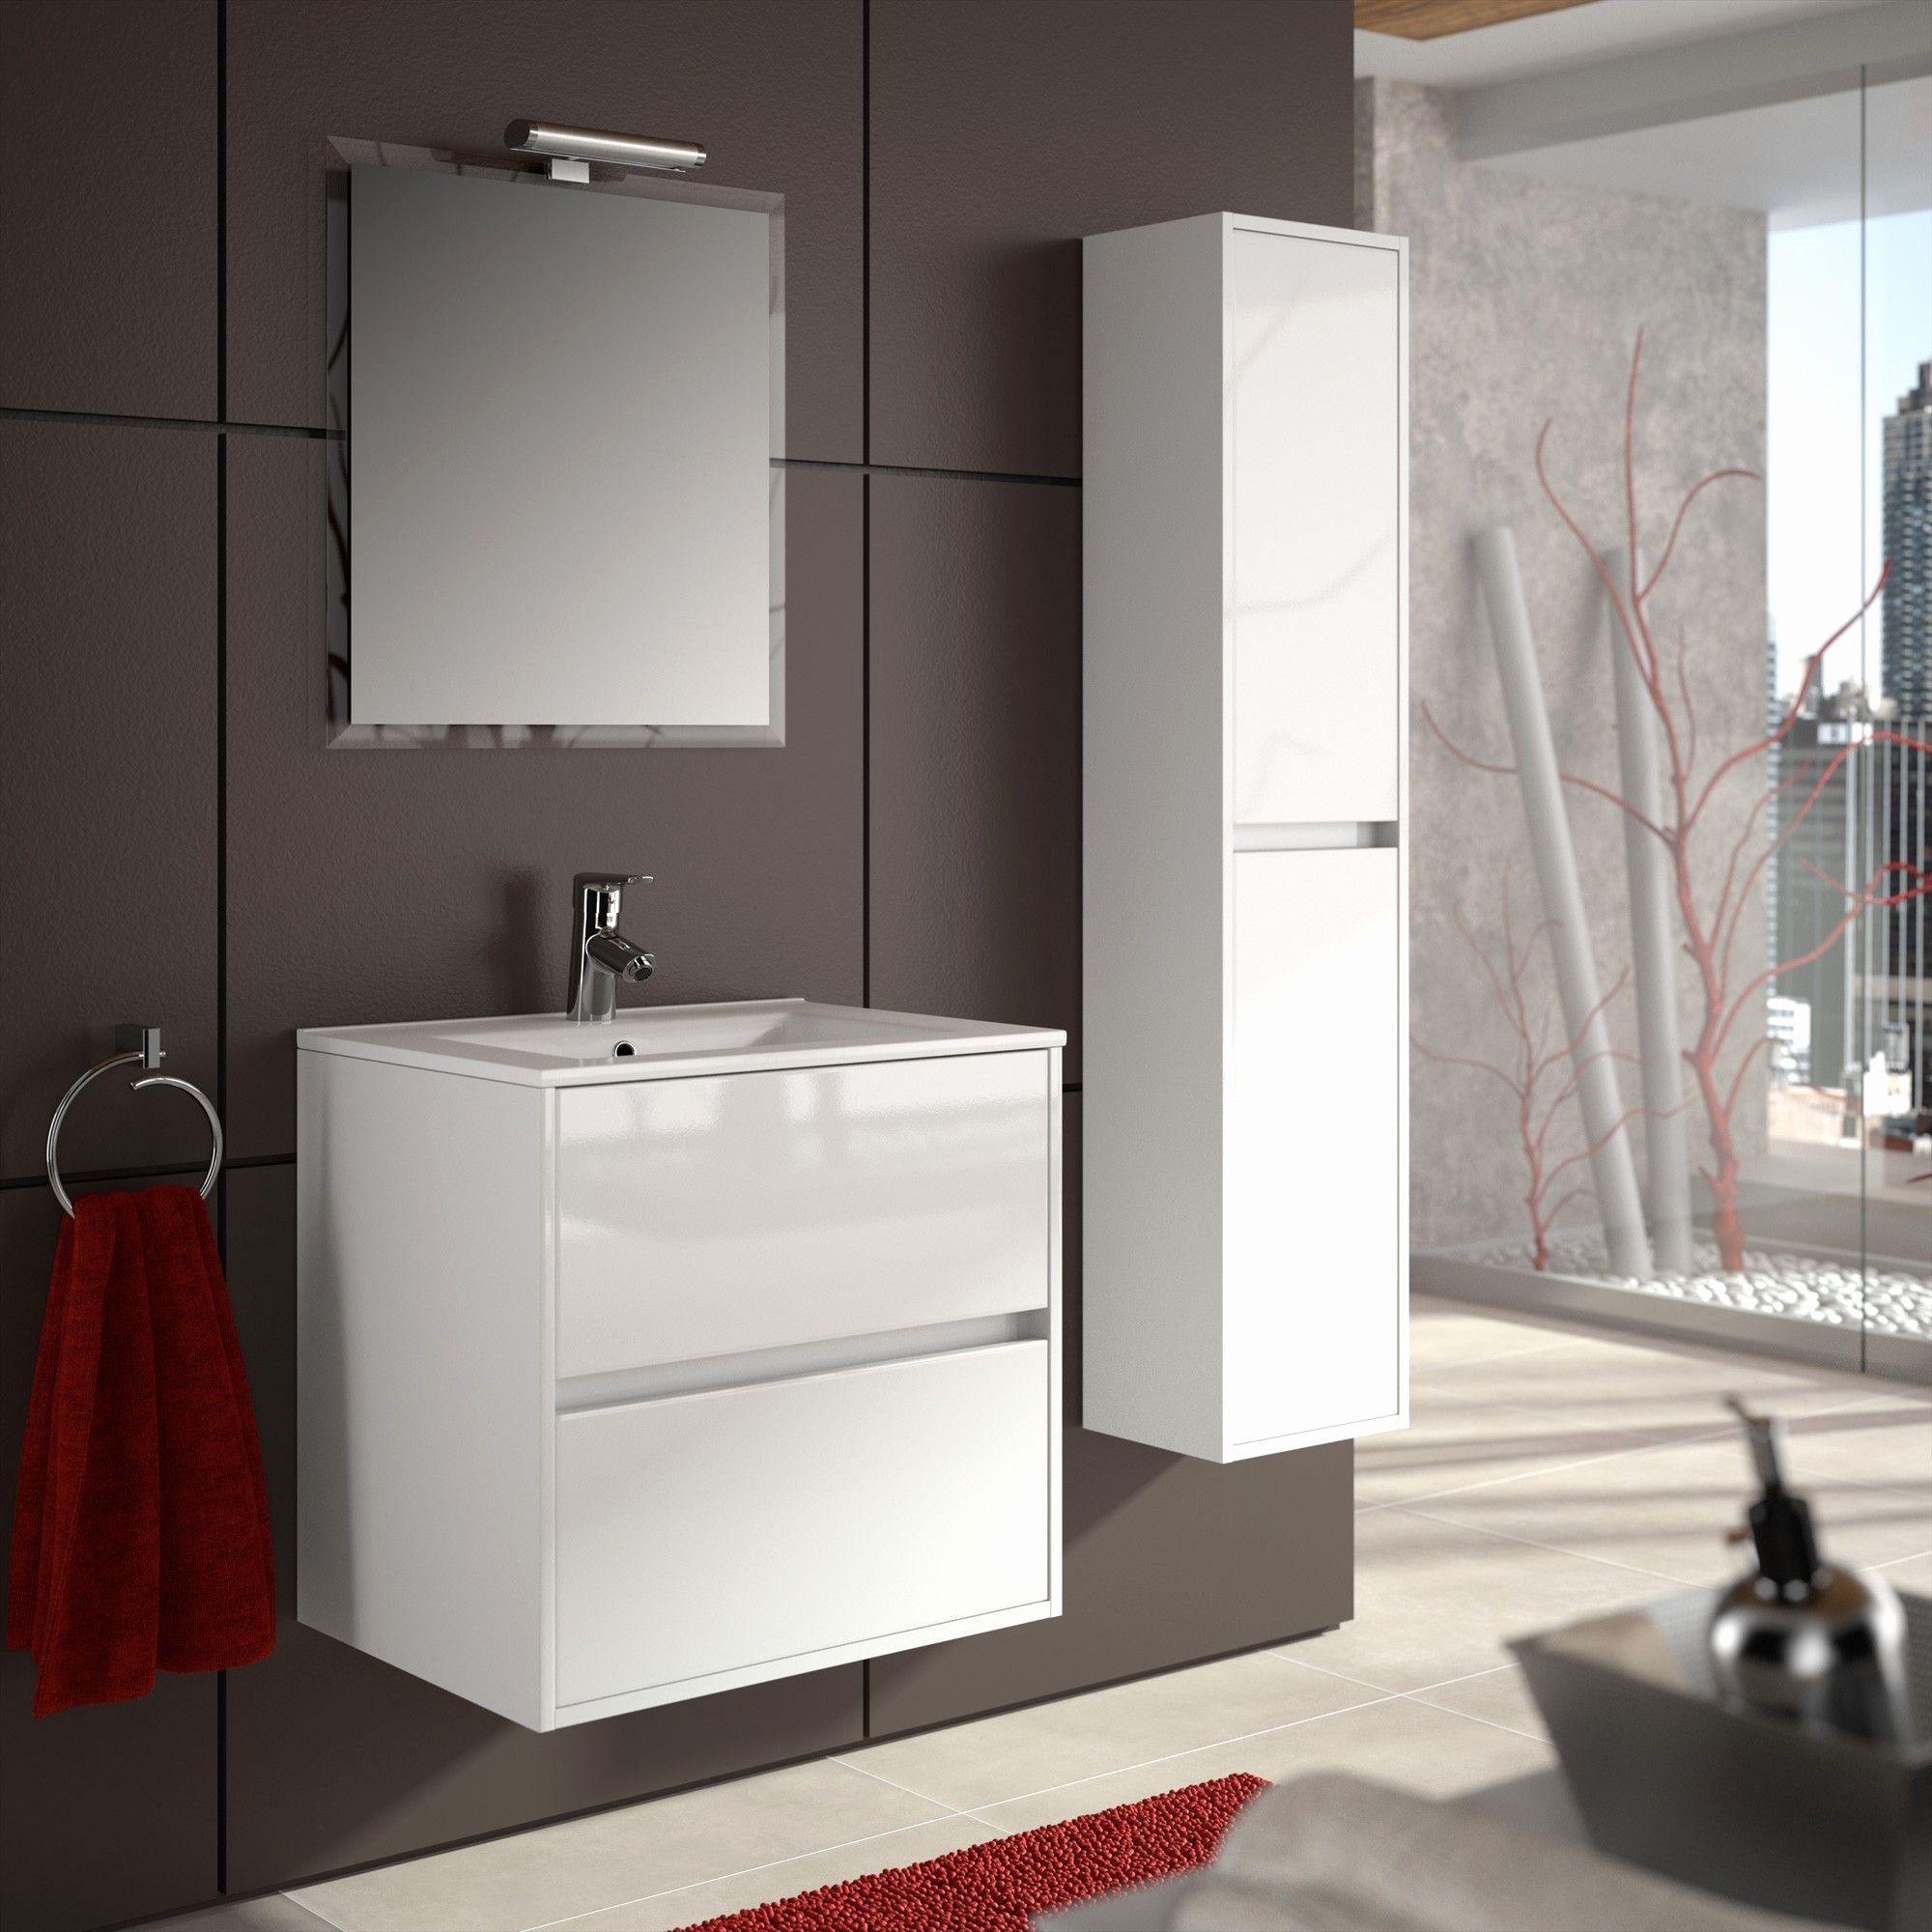 Fresh Meuble Salle De Bain Sous Pente Bathroom Renovations Bathroom Bathroom Vanity